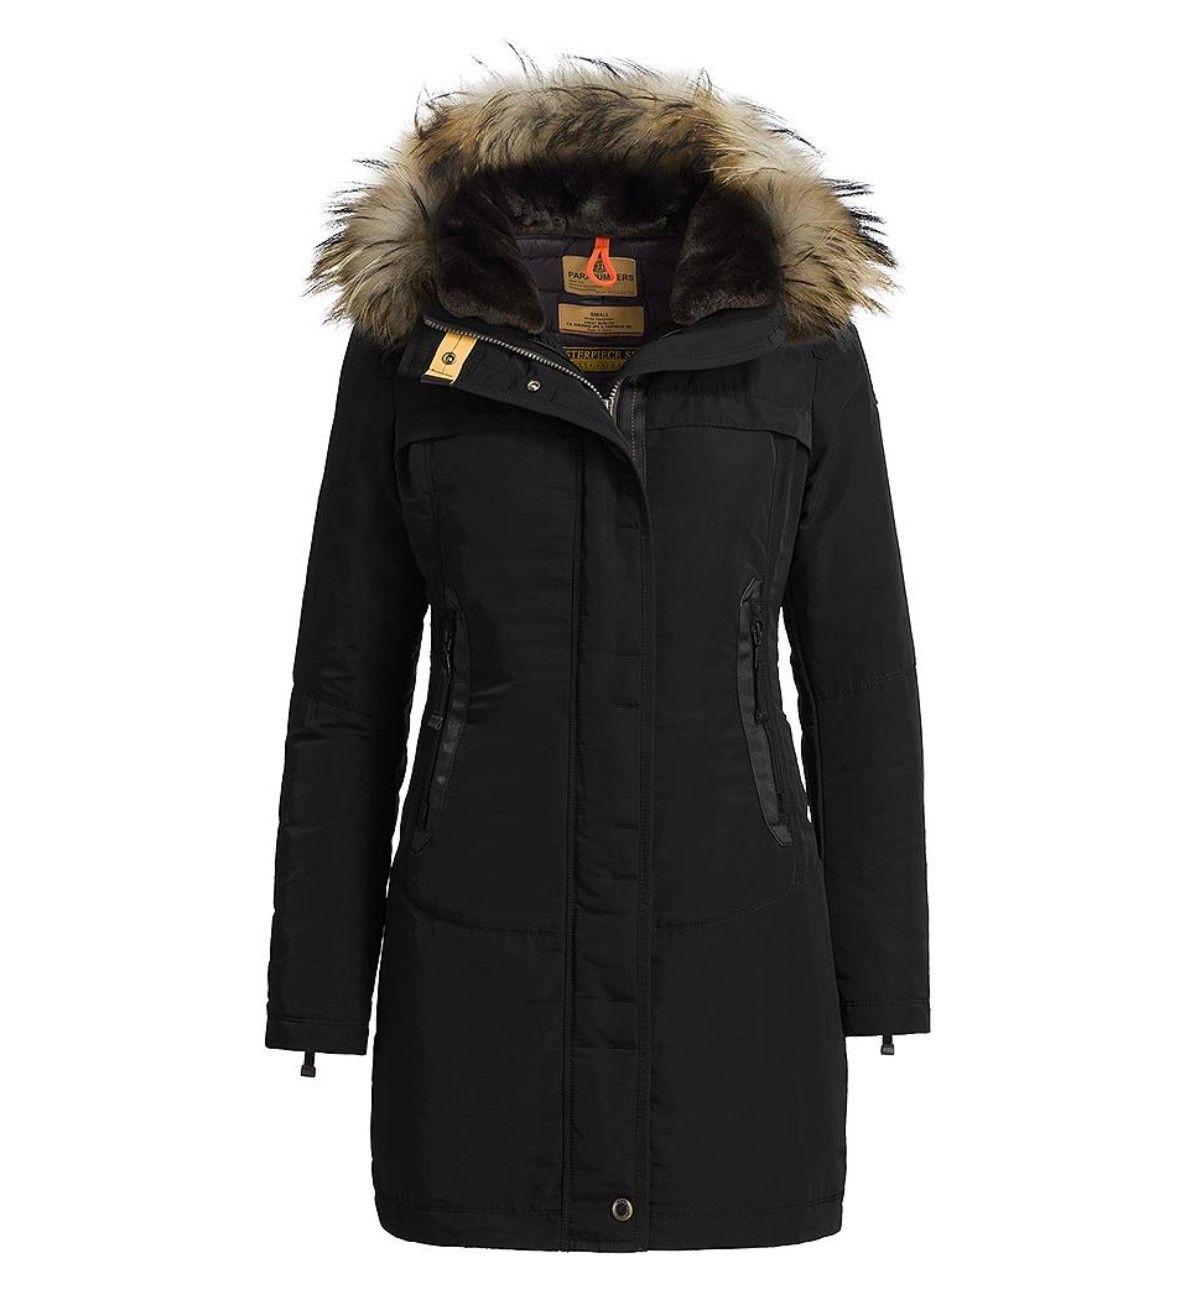 Parajumper jakke som ny | FINN.no